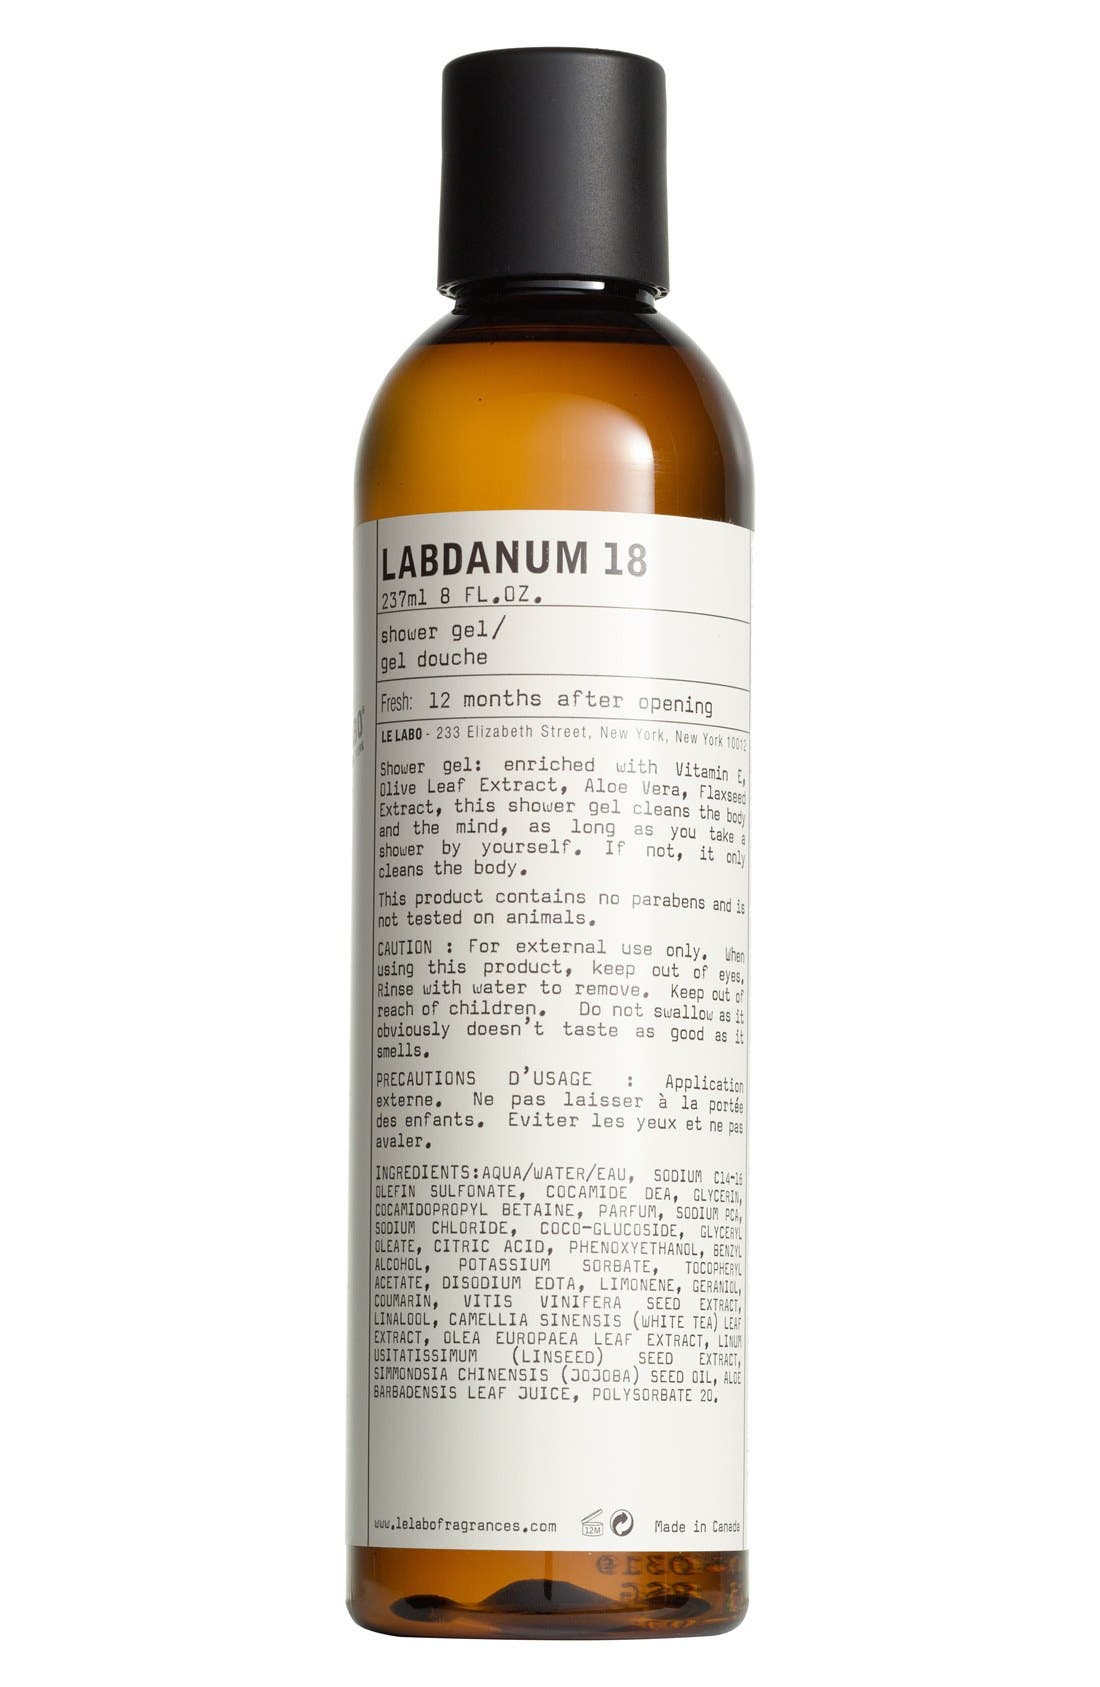 Labdanum 18 Shower Gel